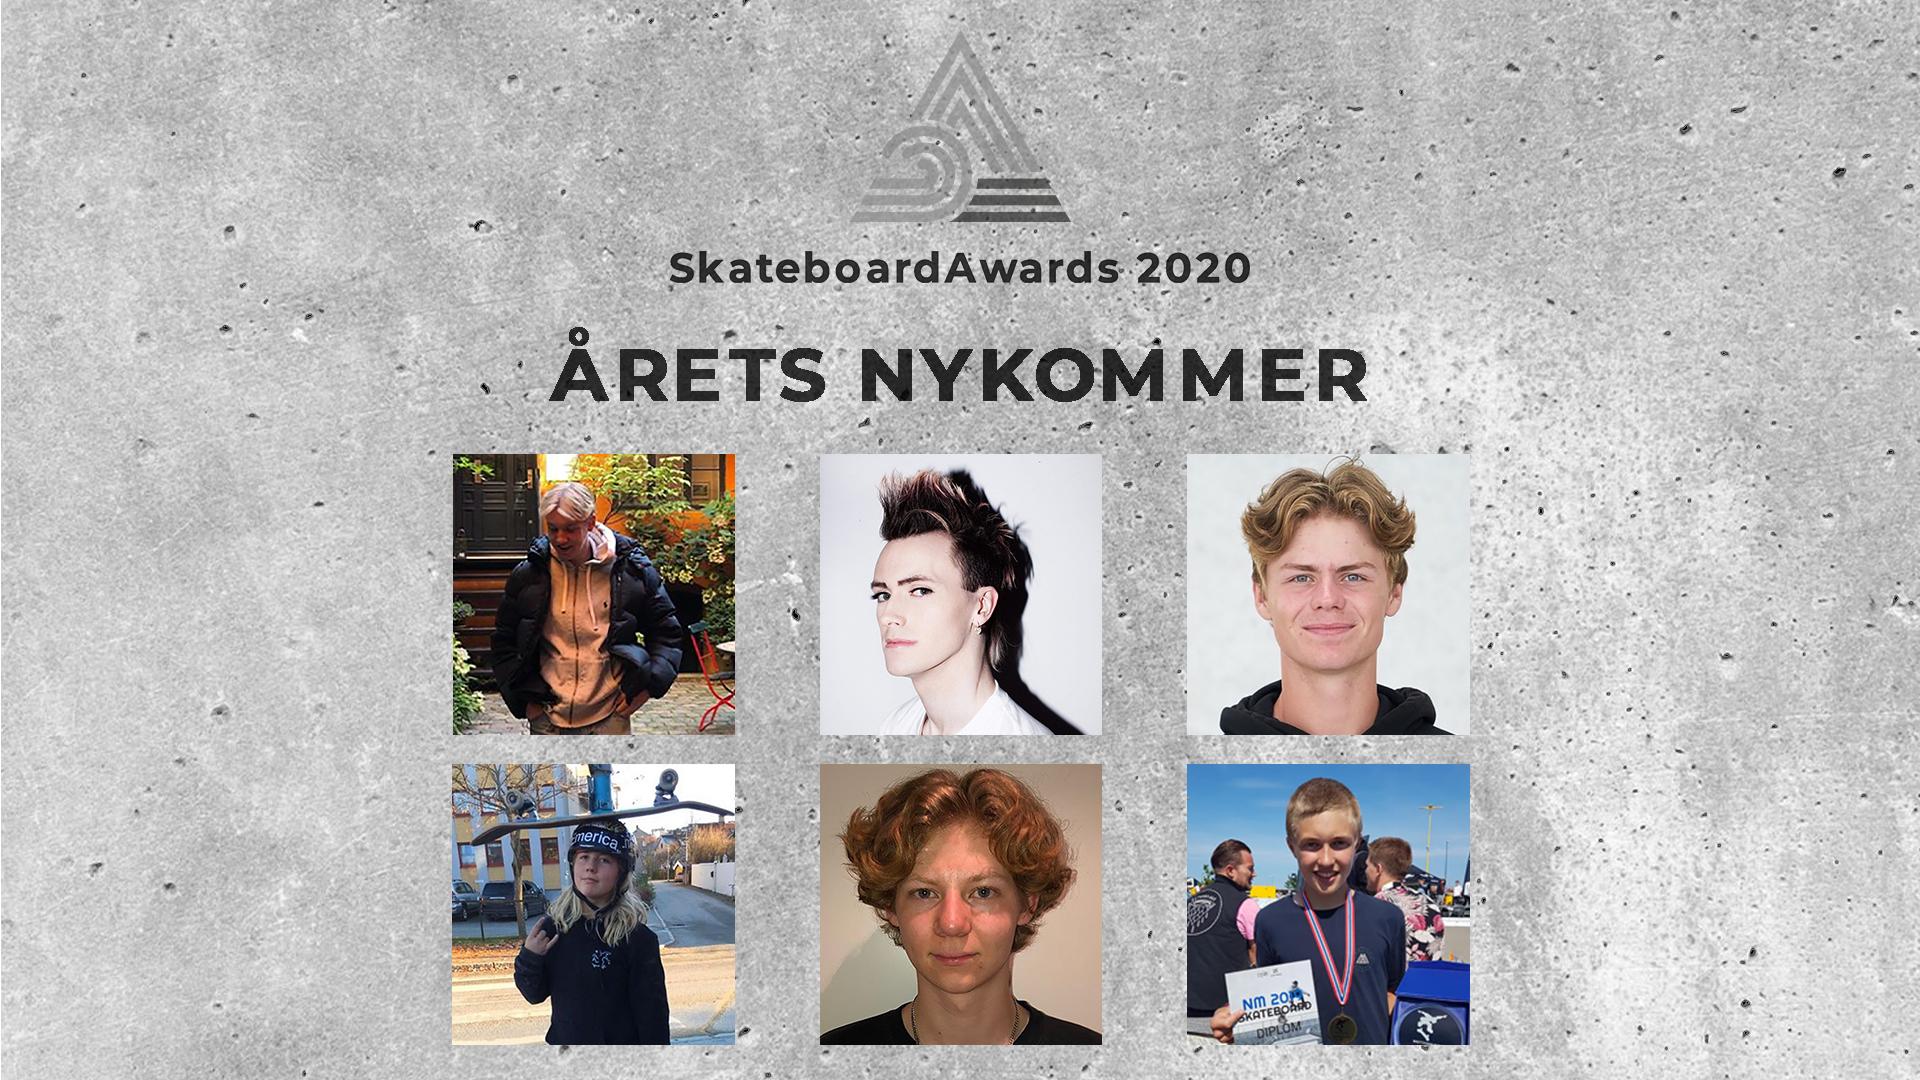 Disse er nominert til årets nykommer